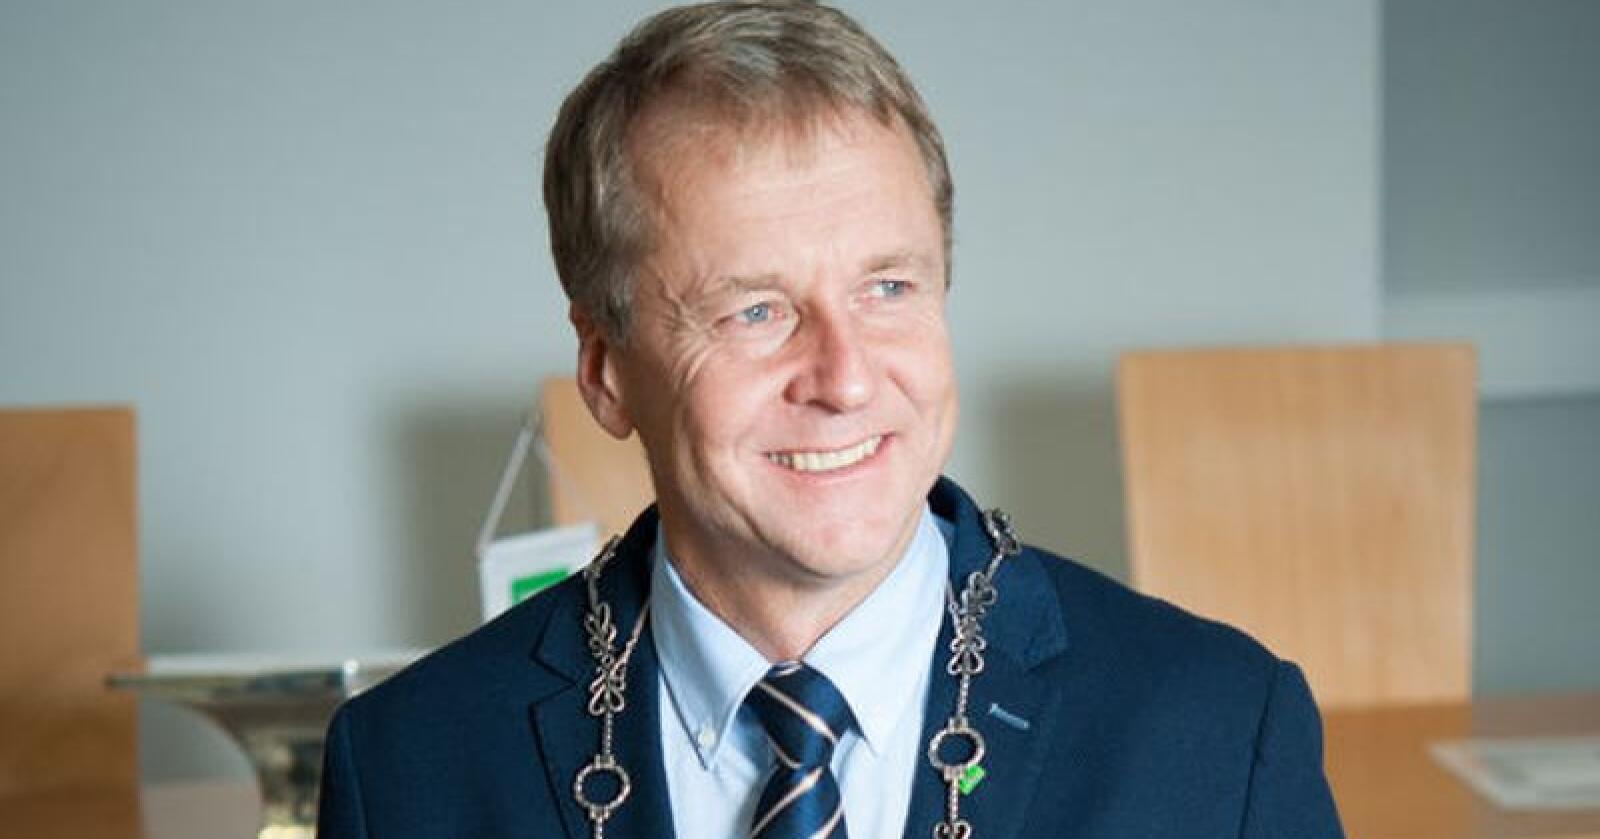 Senterpartiets Saxe Frøshaug blir trolig ordfører i den nye storkommunen Indre Østfold. Han er i dag ordfører i Trøgstad. Foto: Trøgstad kommune